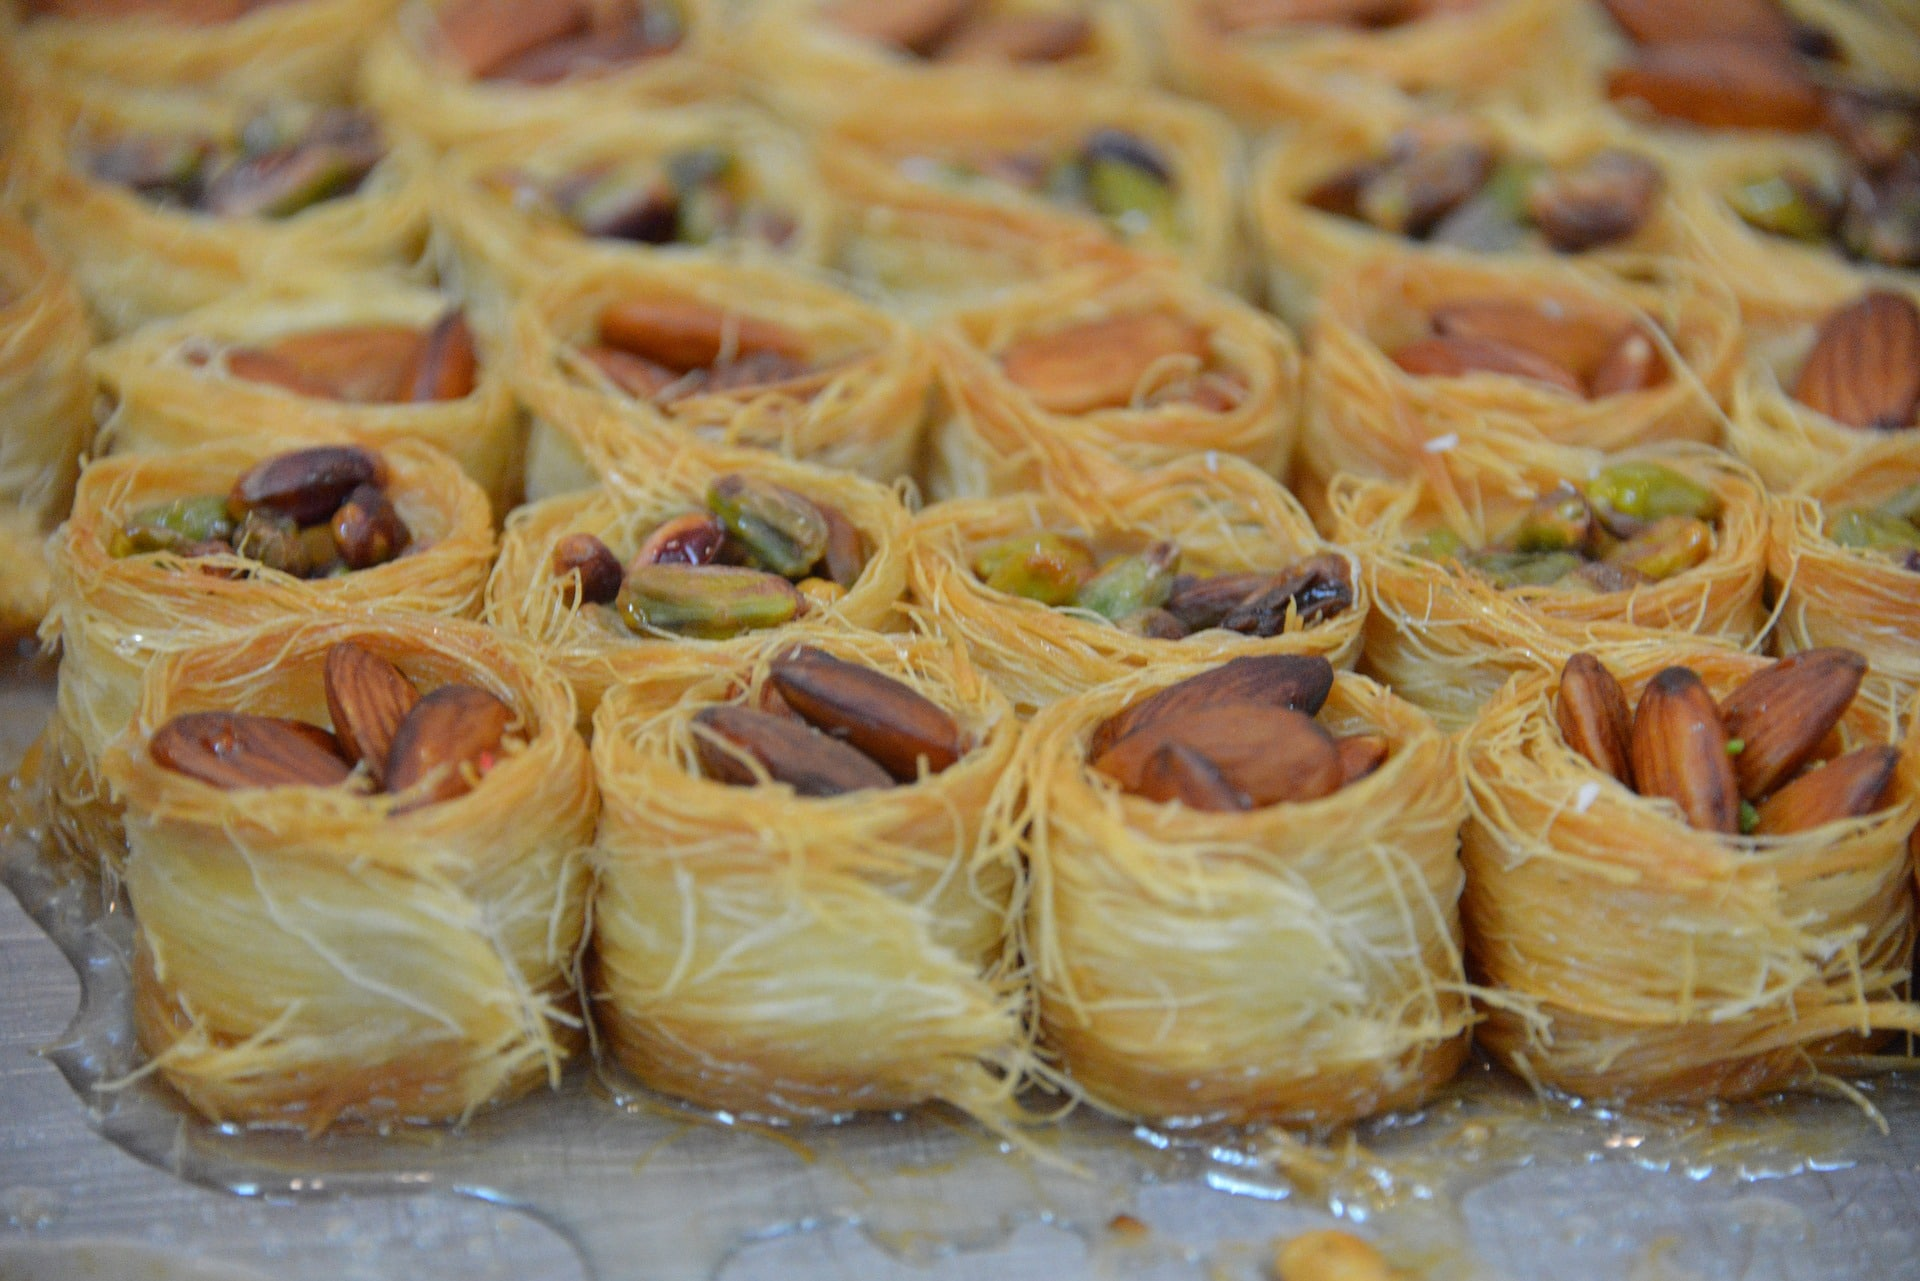 Cambozola with Pistachio and Almond Appetizer Bite via @mermaidsandmojitos